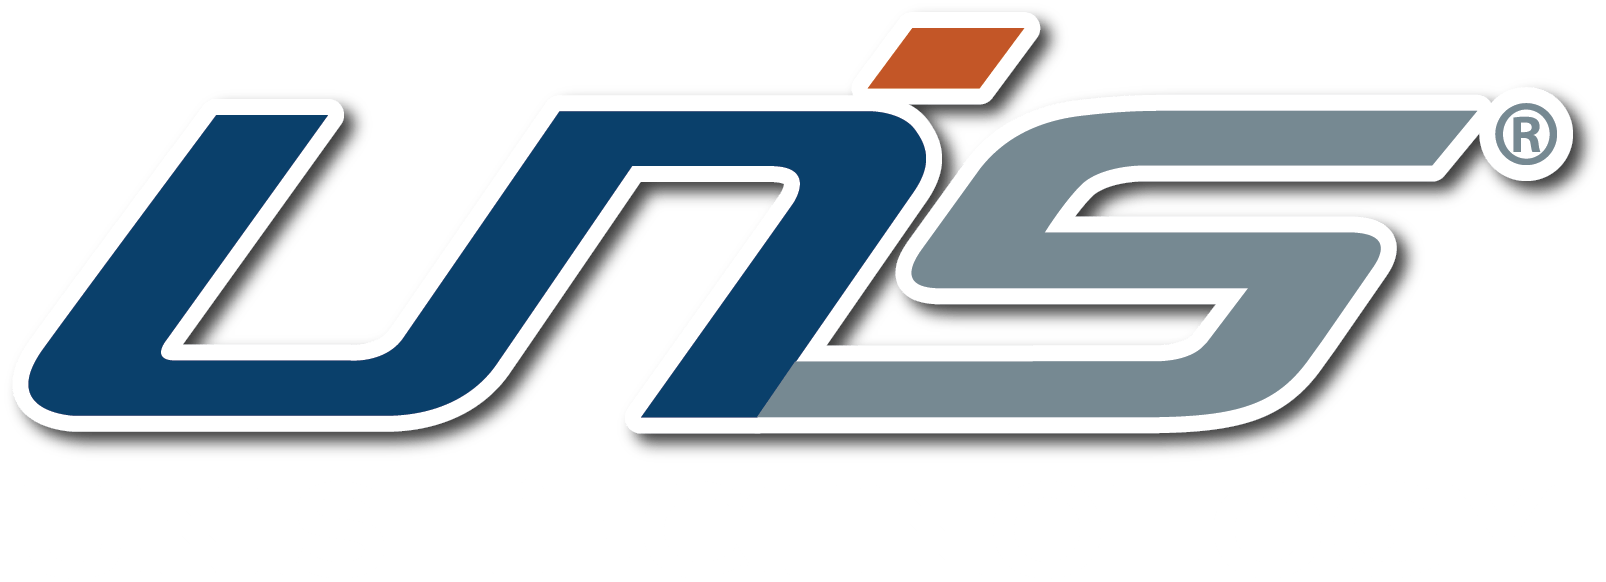 UNIS Technology Ltd.